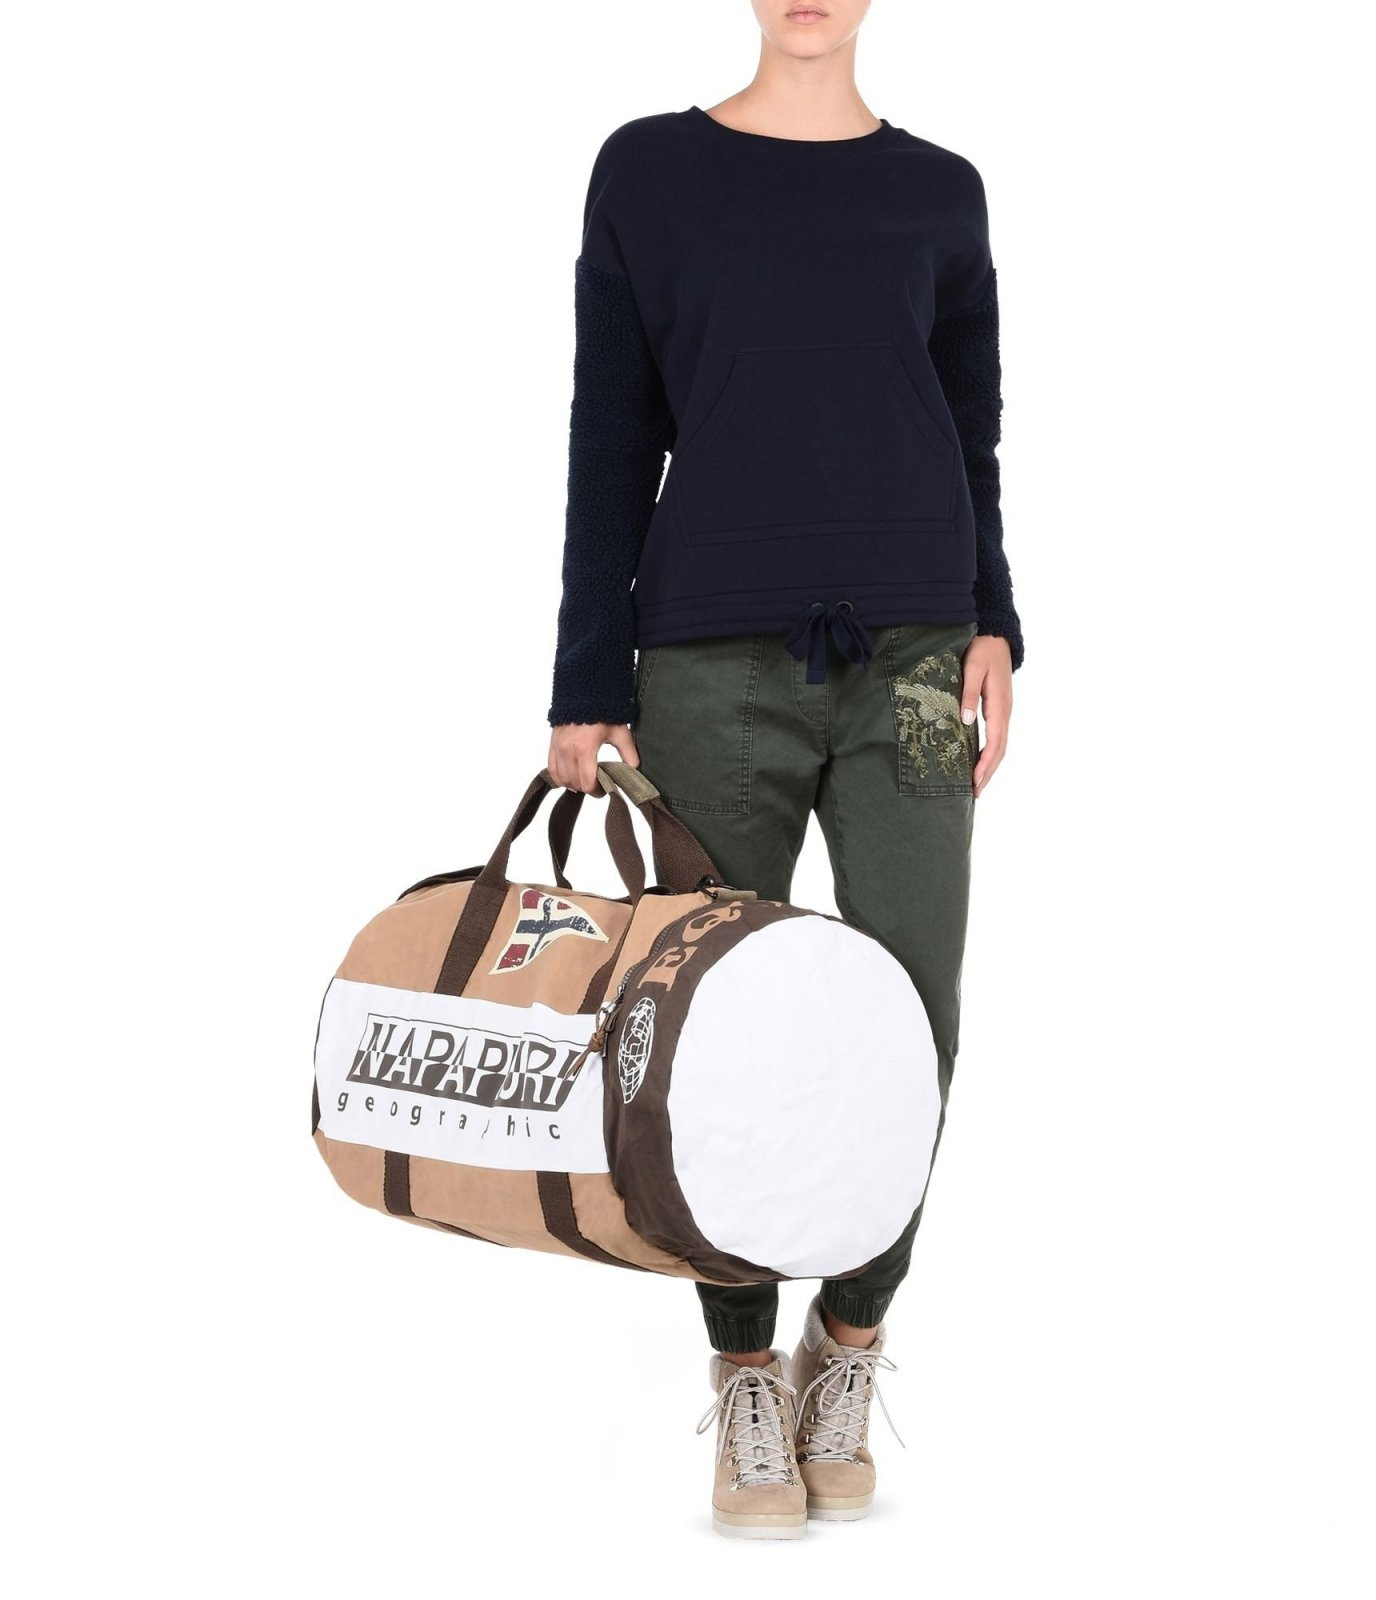 gros sac awesome forme de voyage en gros sac de rangement sacs non tisss sac poussire. Black Bedroom Furniture Sets. Home Design Ideas